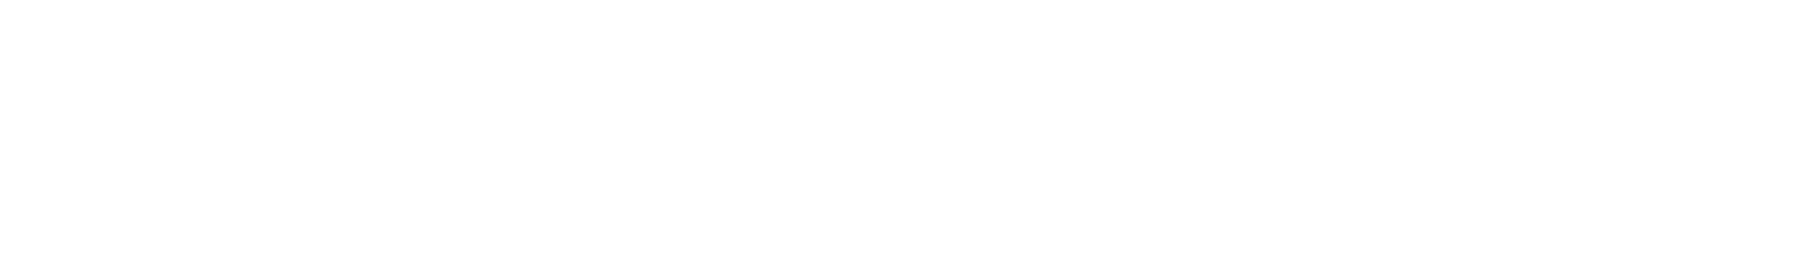 102 electrobass a